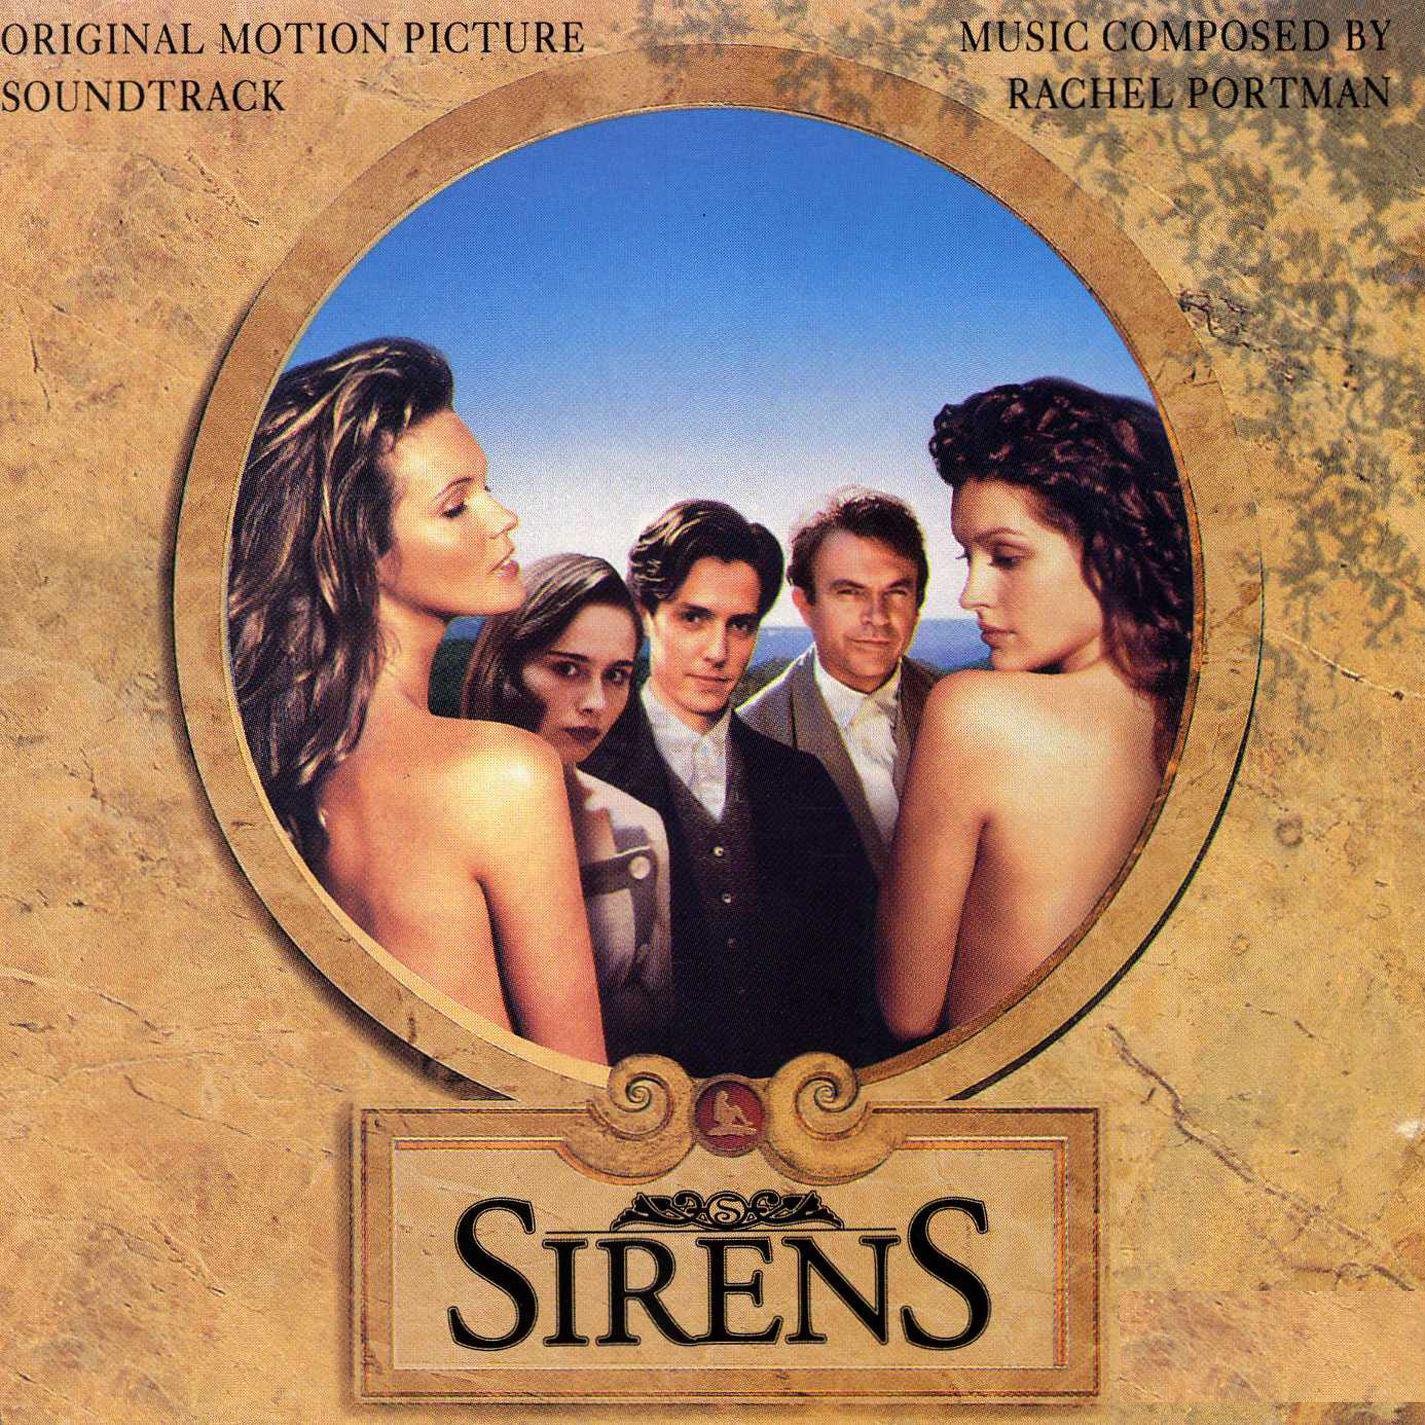 Sirens Original Motion Picture Soundtrack